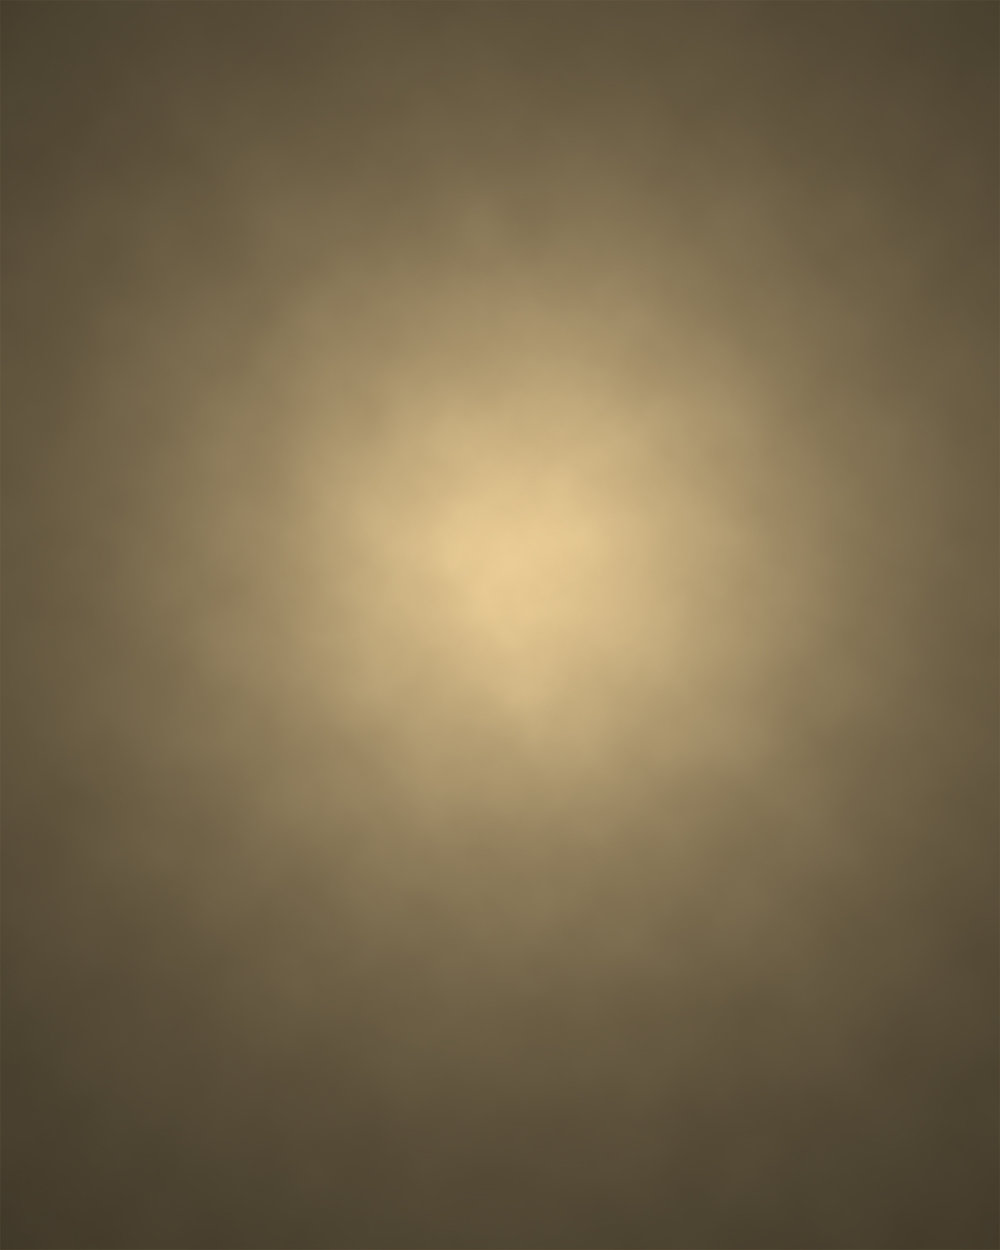 Background Option #9 - Gold/Tan